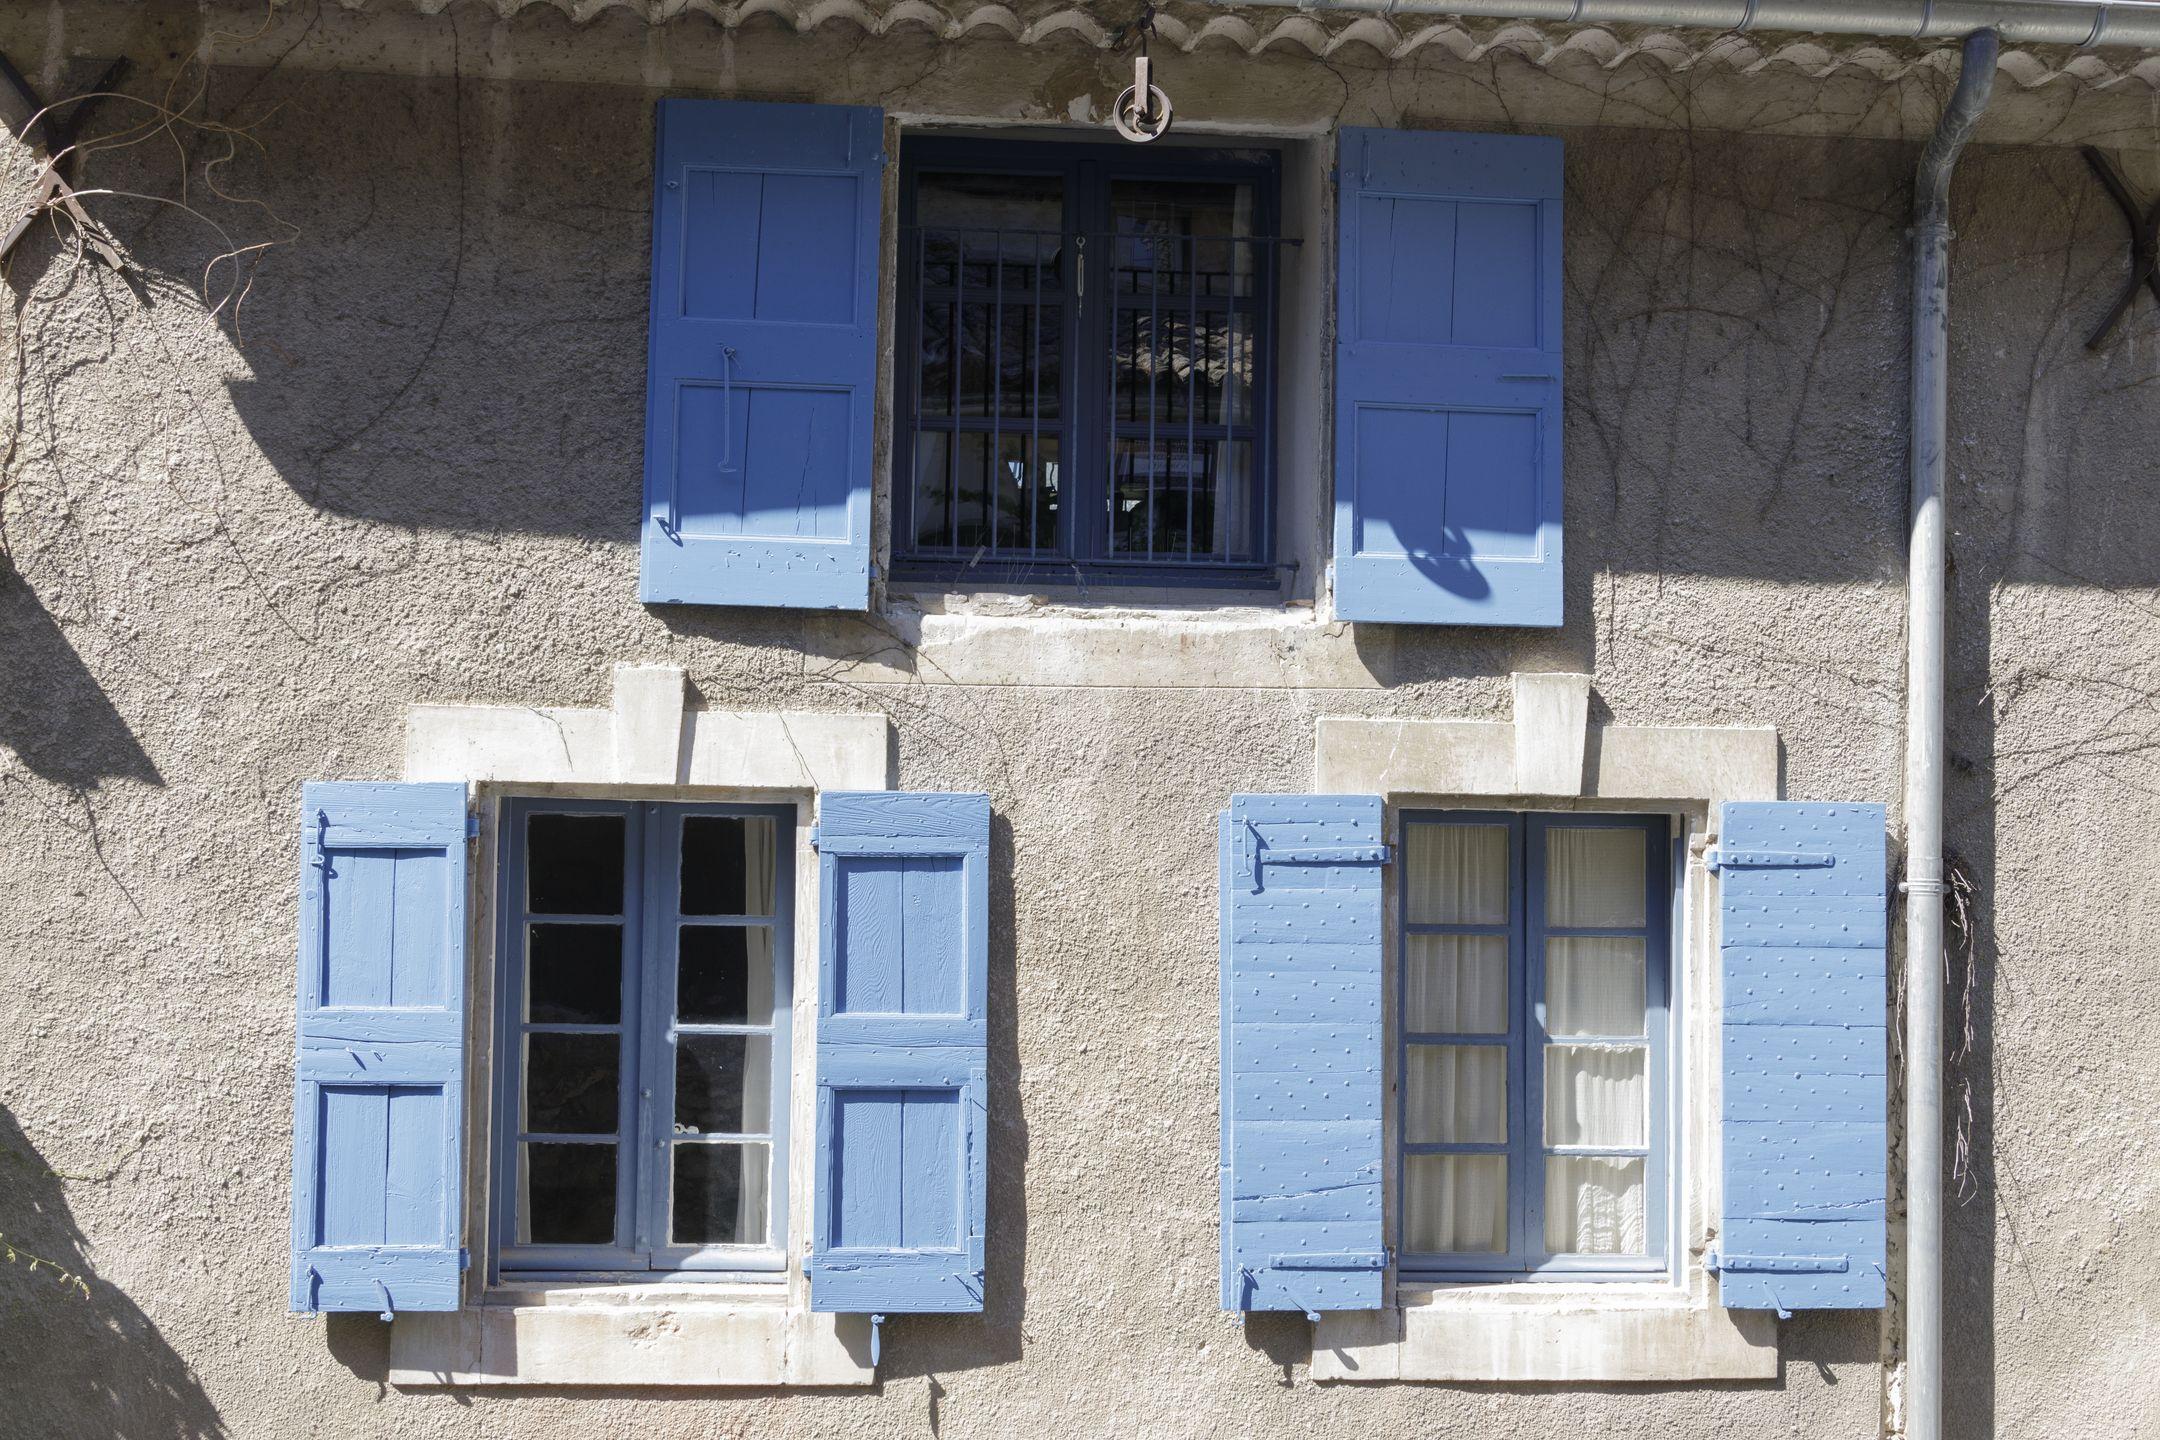 20210701-Provence-10-44-50-015